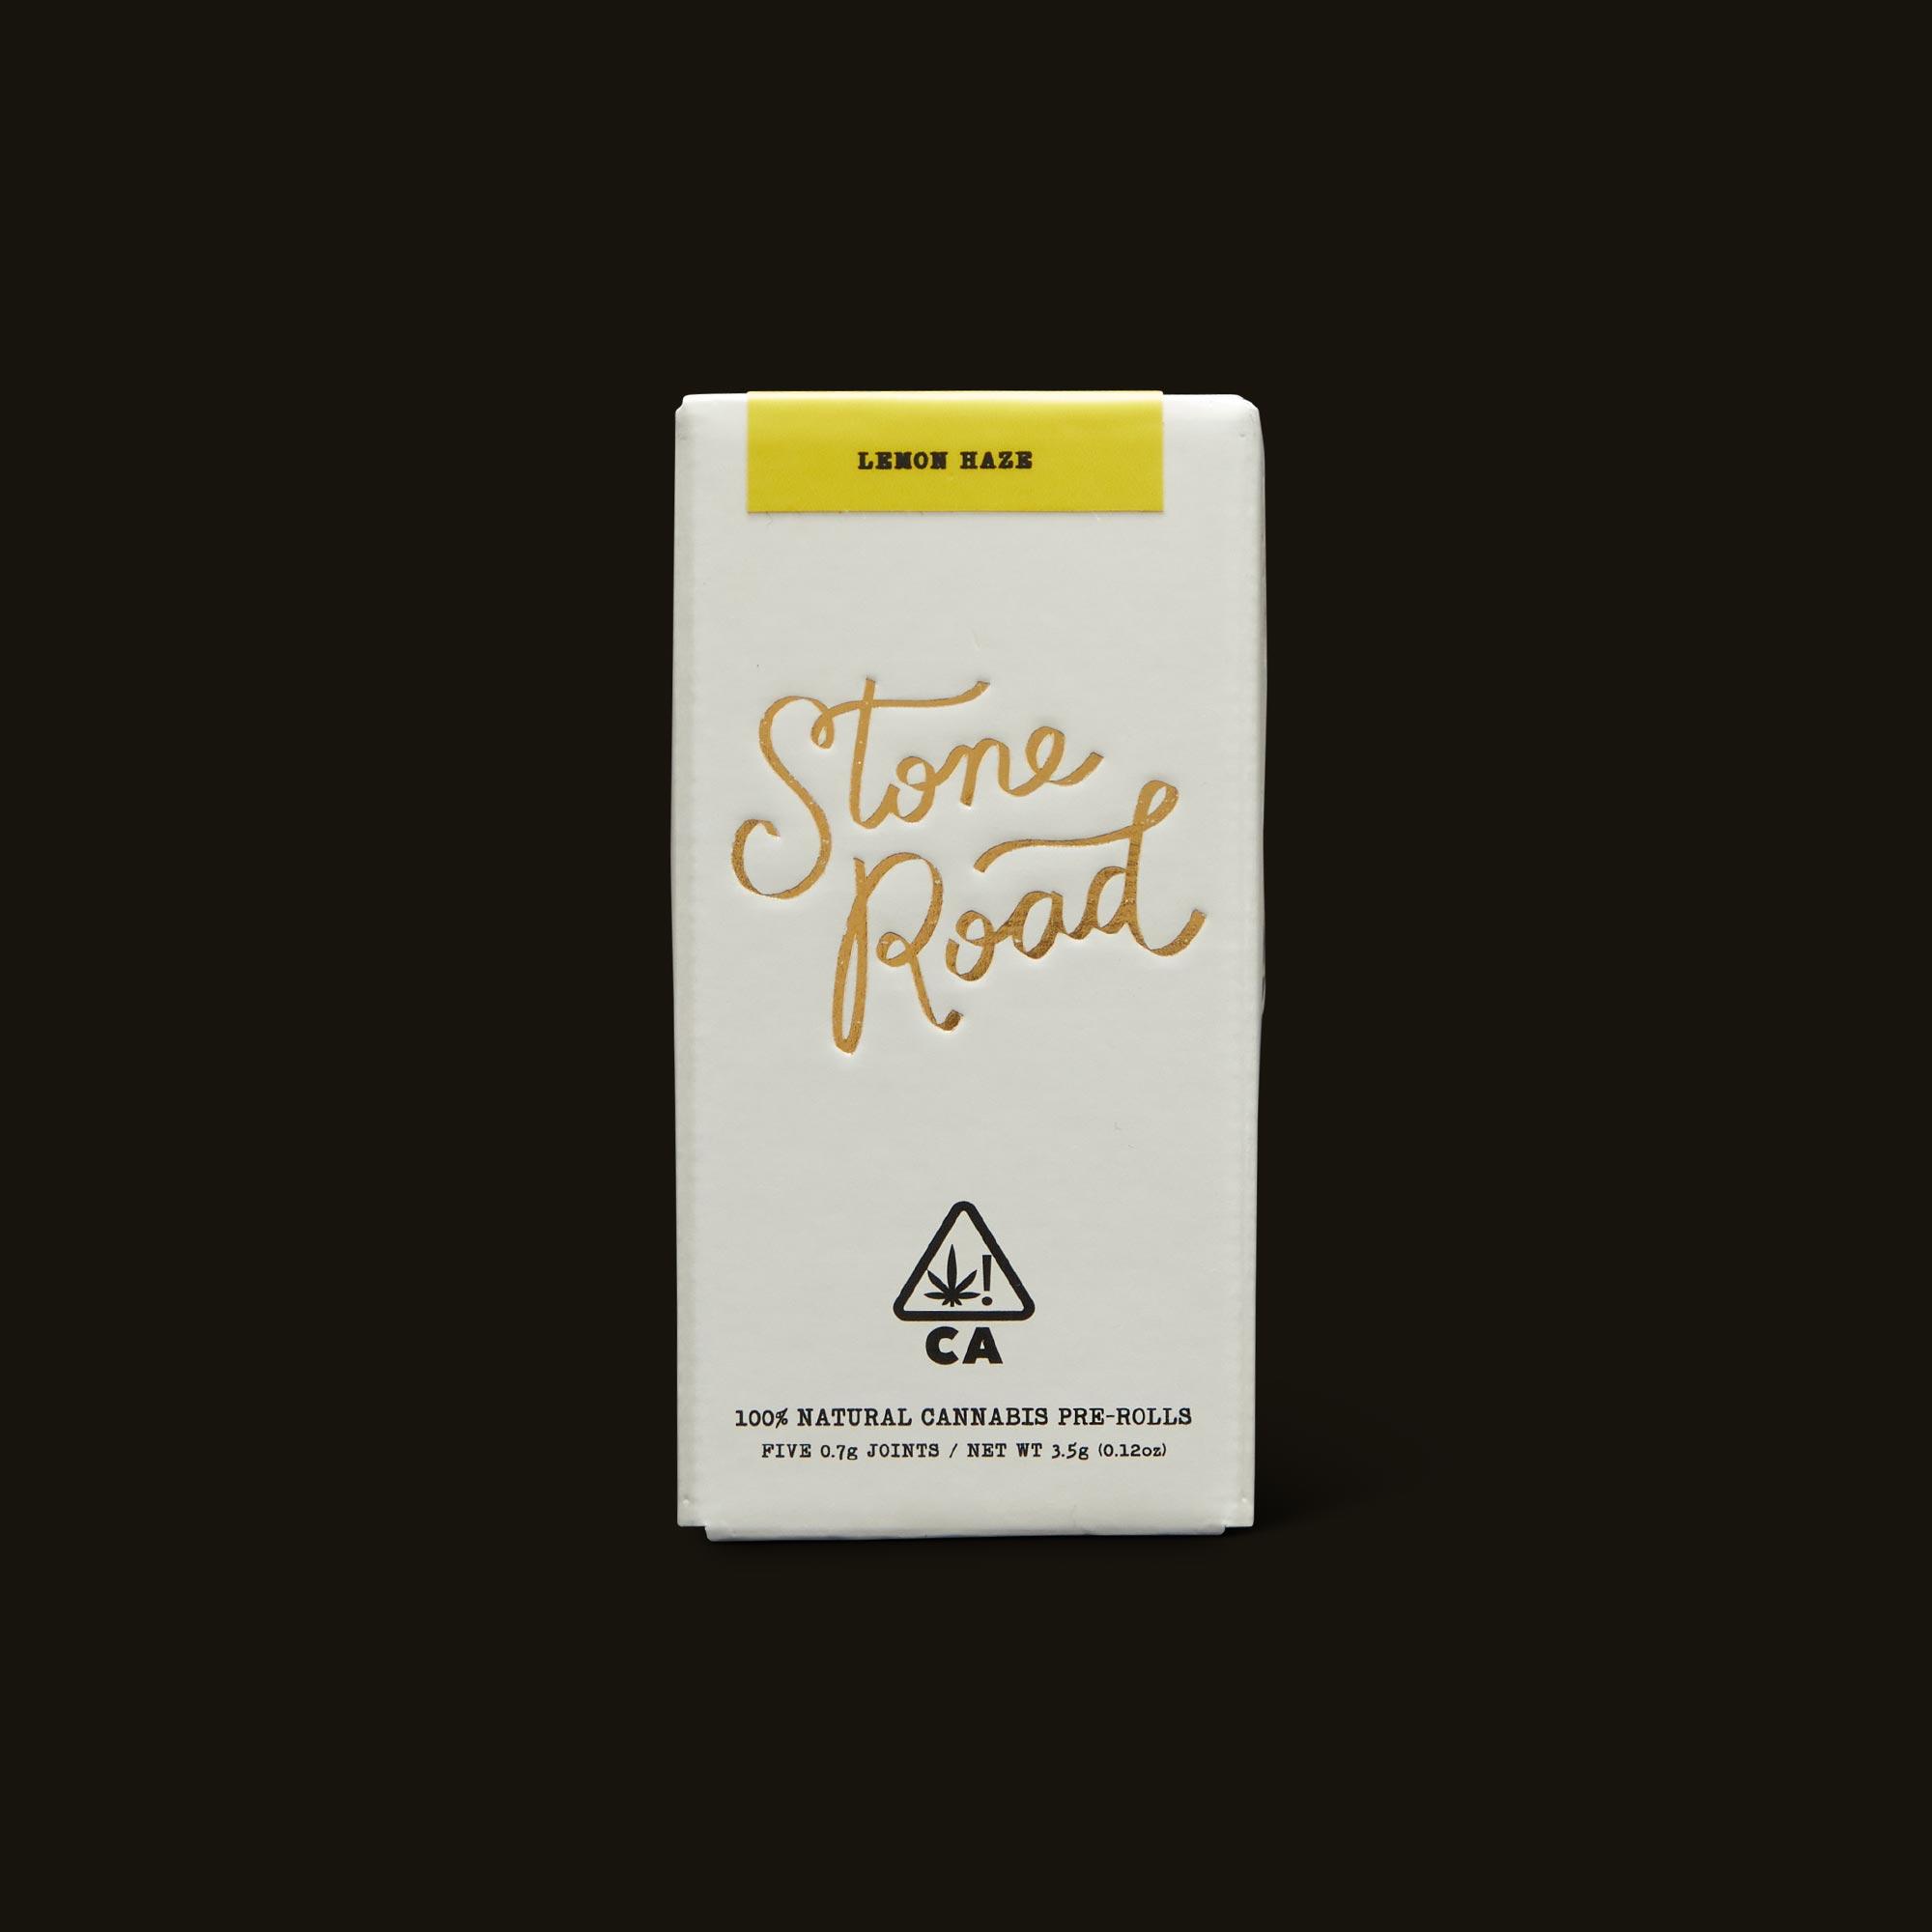 Lemon Haze Infused Pre-Roll Pack - Five 0.7g joints